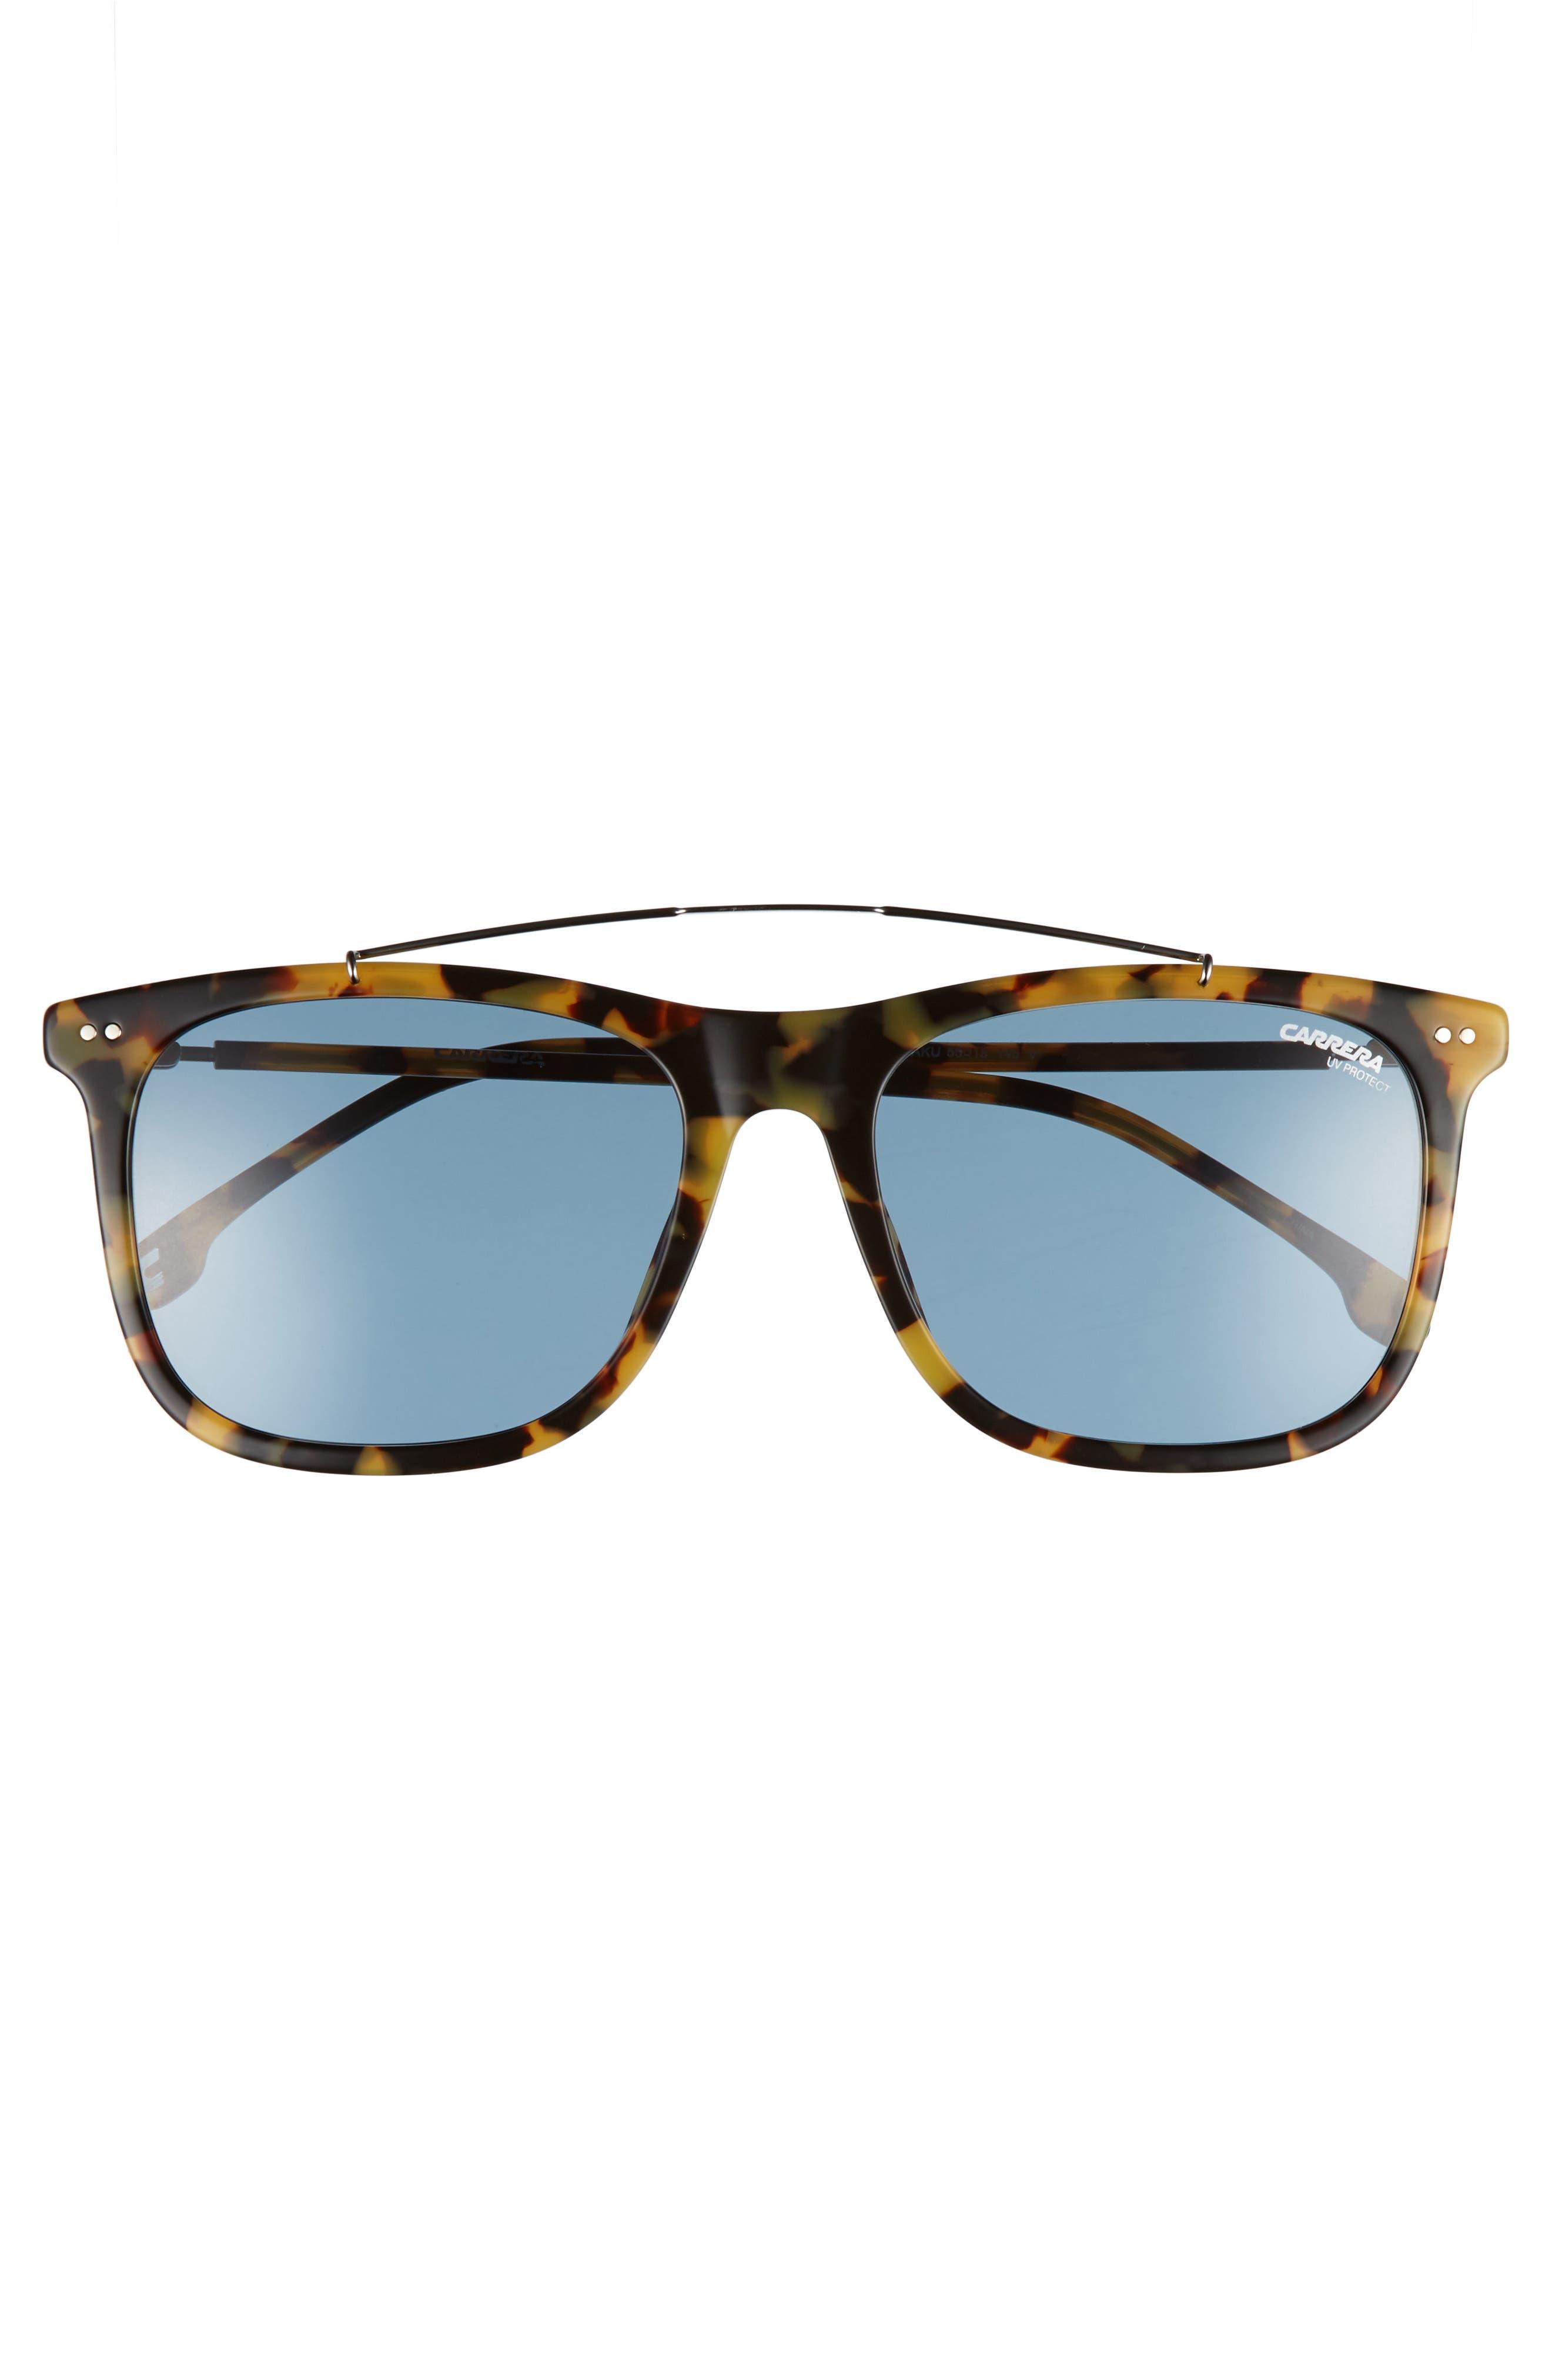 Carrera 150/S 55mm Sunglasses,                             Alternate thumbnail 2, color,                             Havana Ruthenium/ Blue Avio